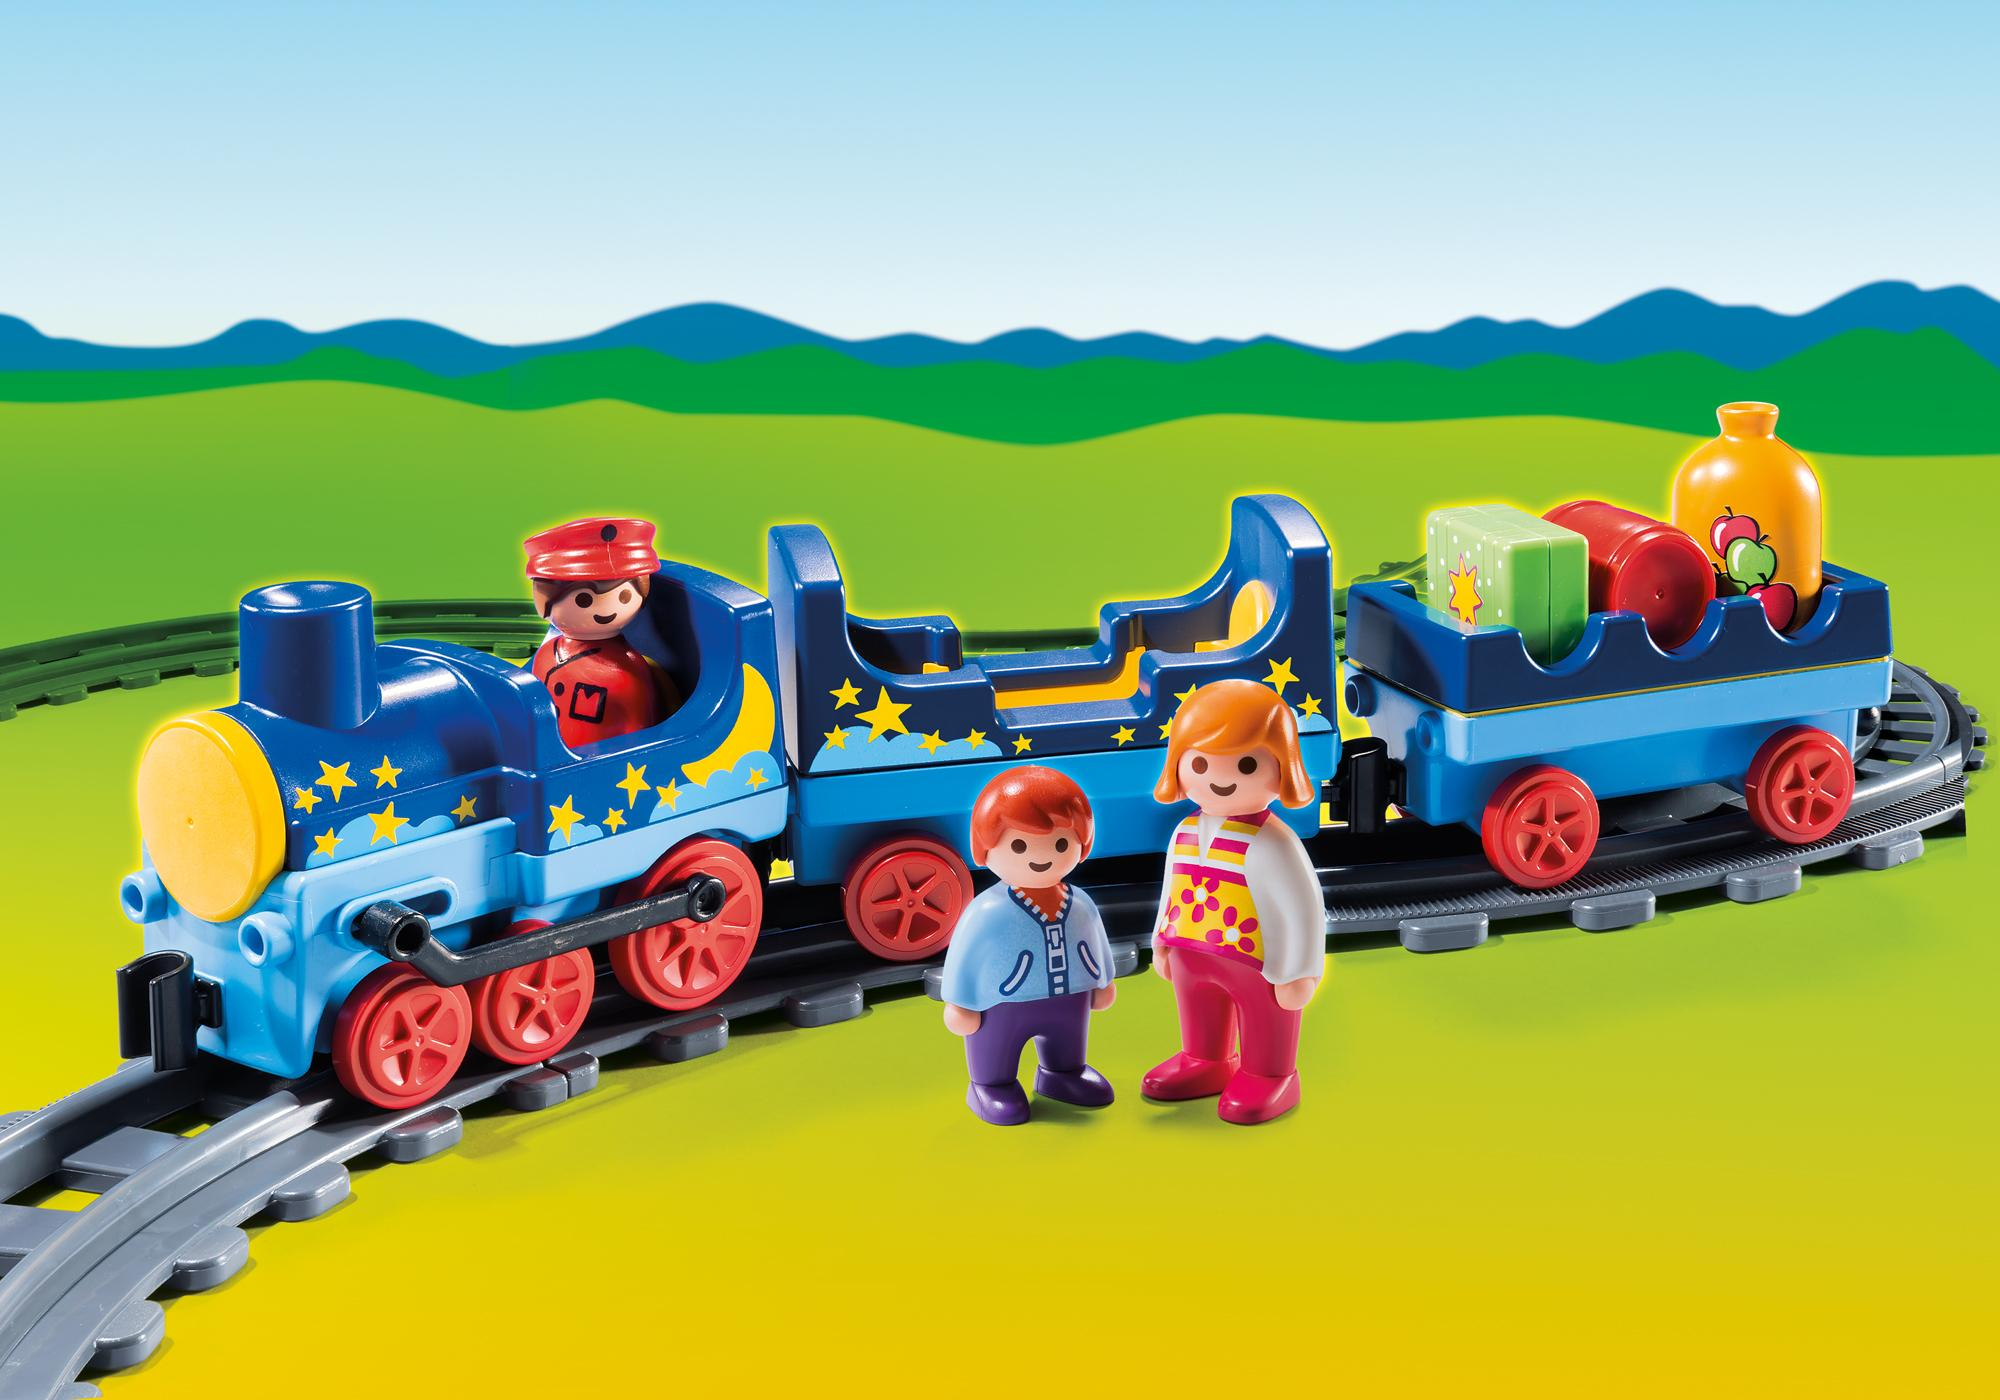 http://media.playmobil.com/i/playmobil/6880_product_detail/1.2.3 Tren con Vías